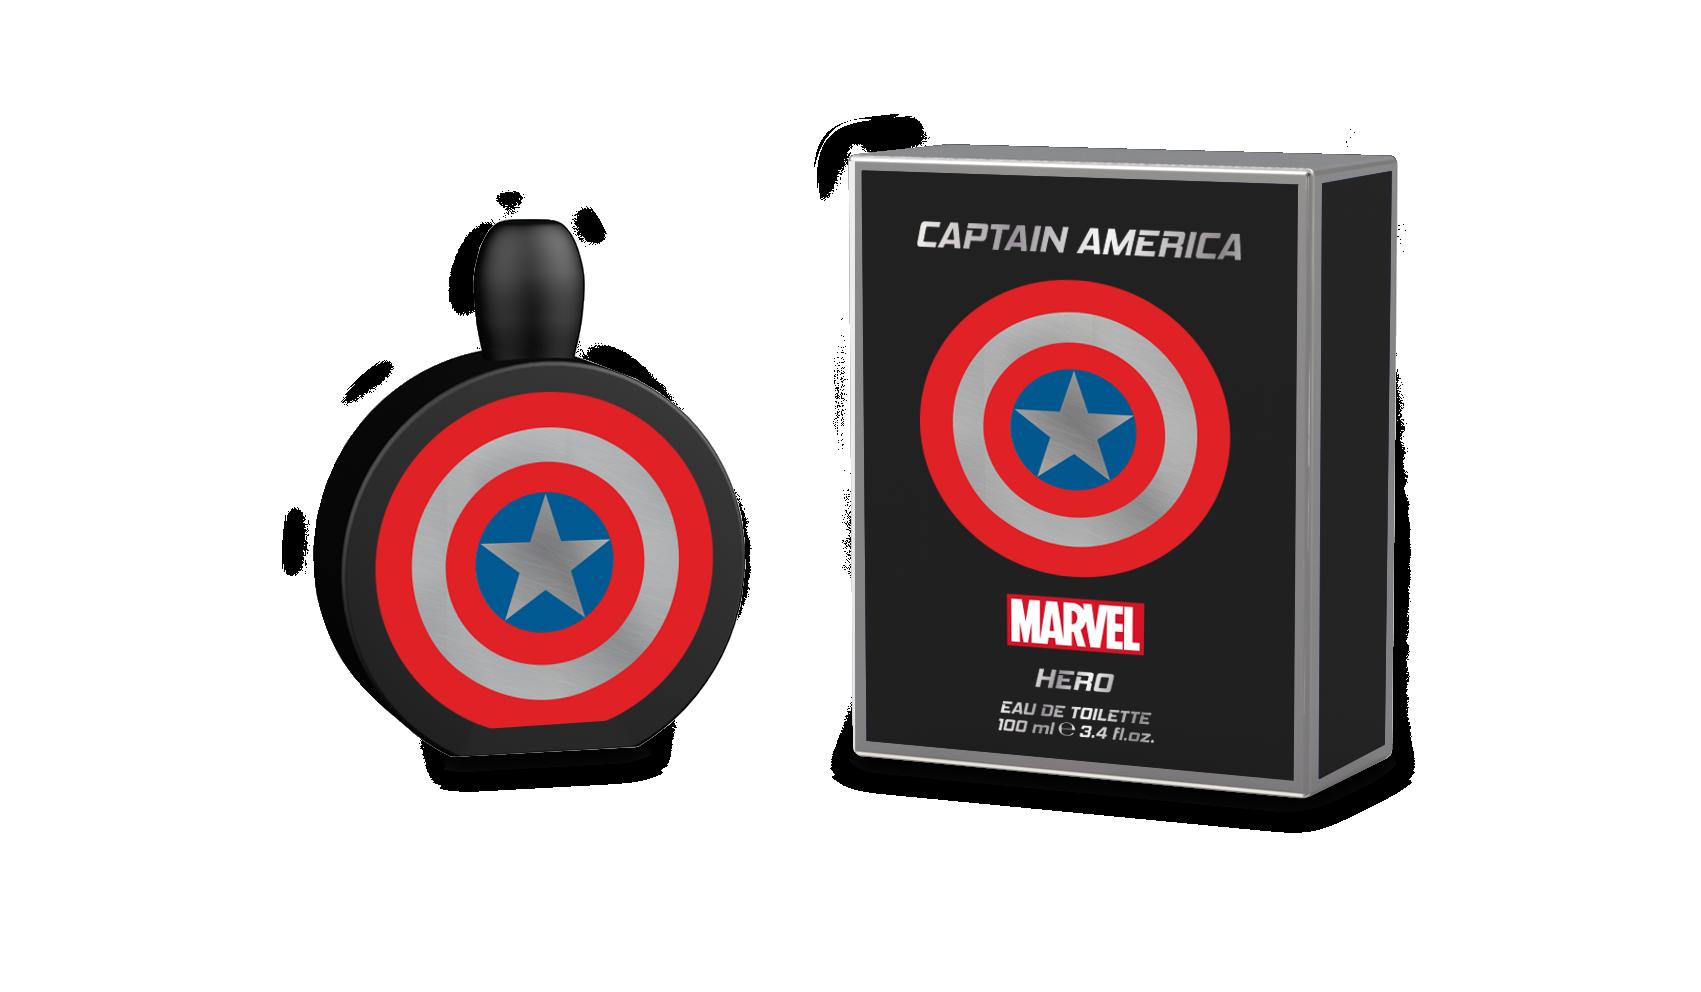 MARVEL CAPTAIN AMERICA HERO 3.4 EDT SP